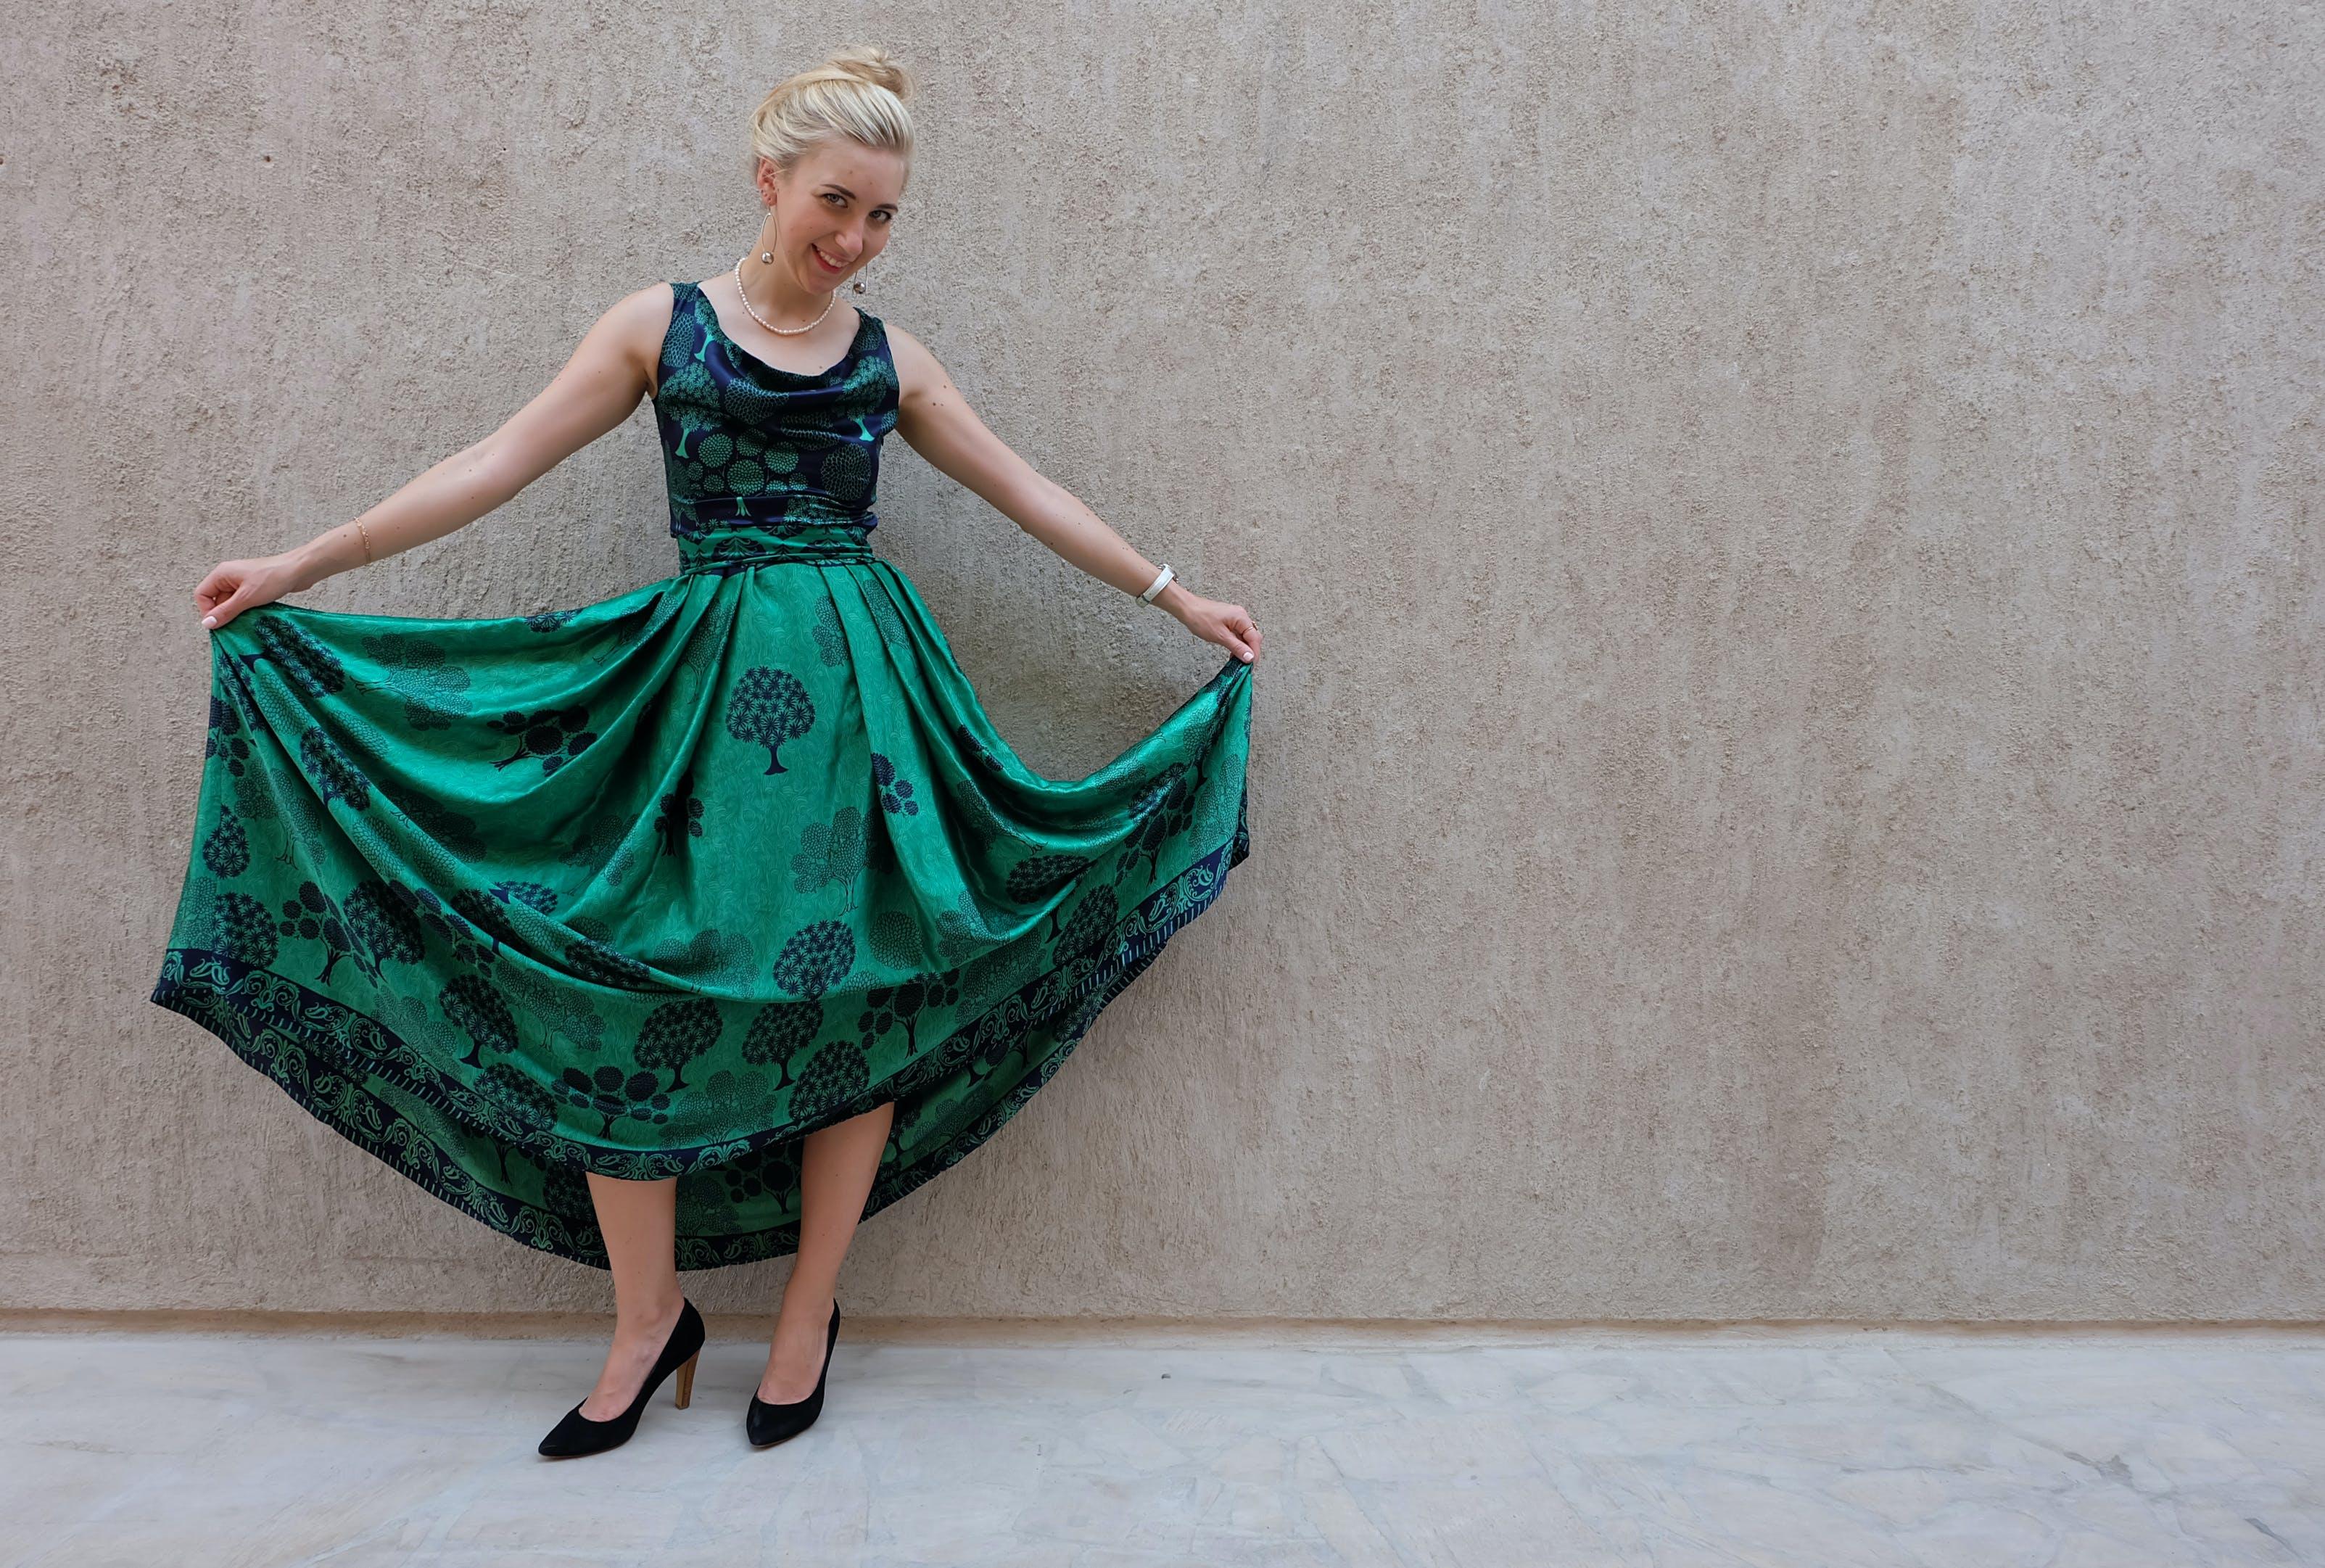 Woman Holding Her Green Dress